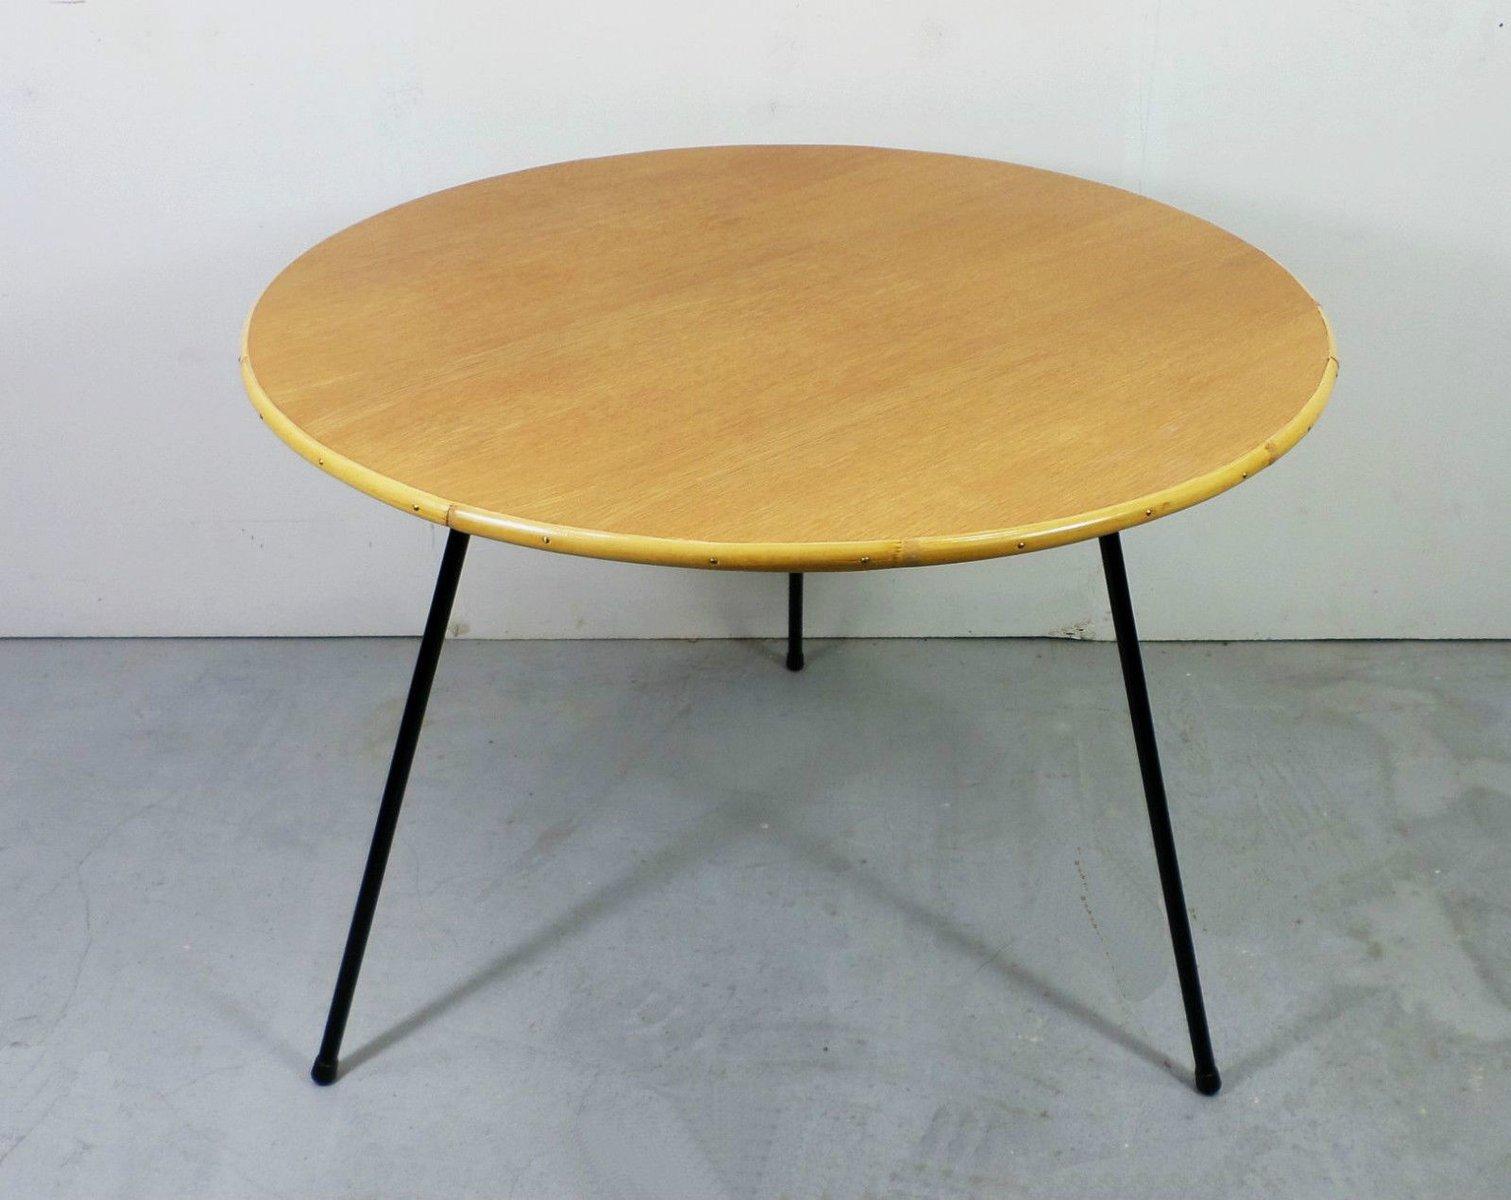 table basse en ch ne en bambou et en m tal allemagne 1950s en vente sur pamono. Black Bedroom Furniture Sets. Home Design Ideas